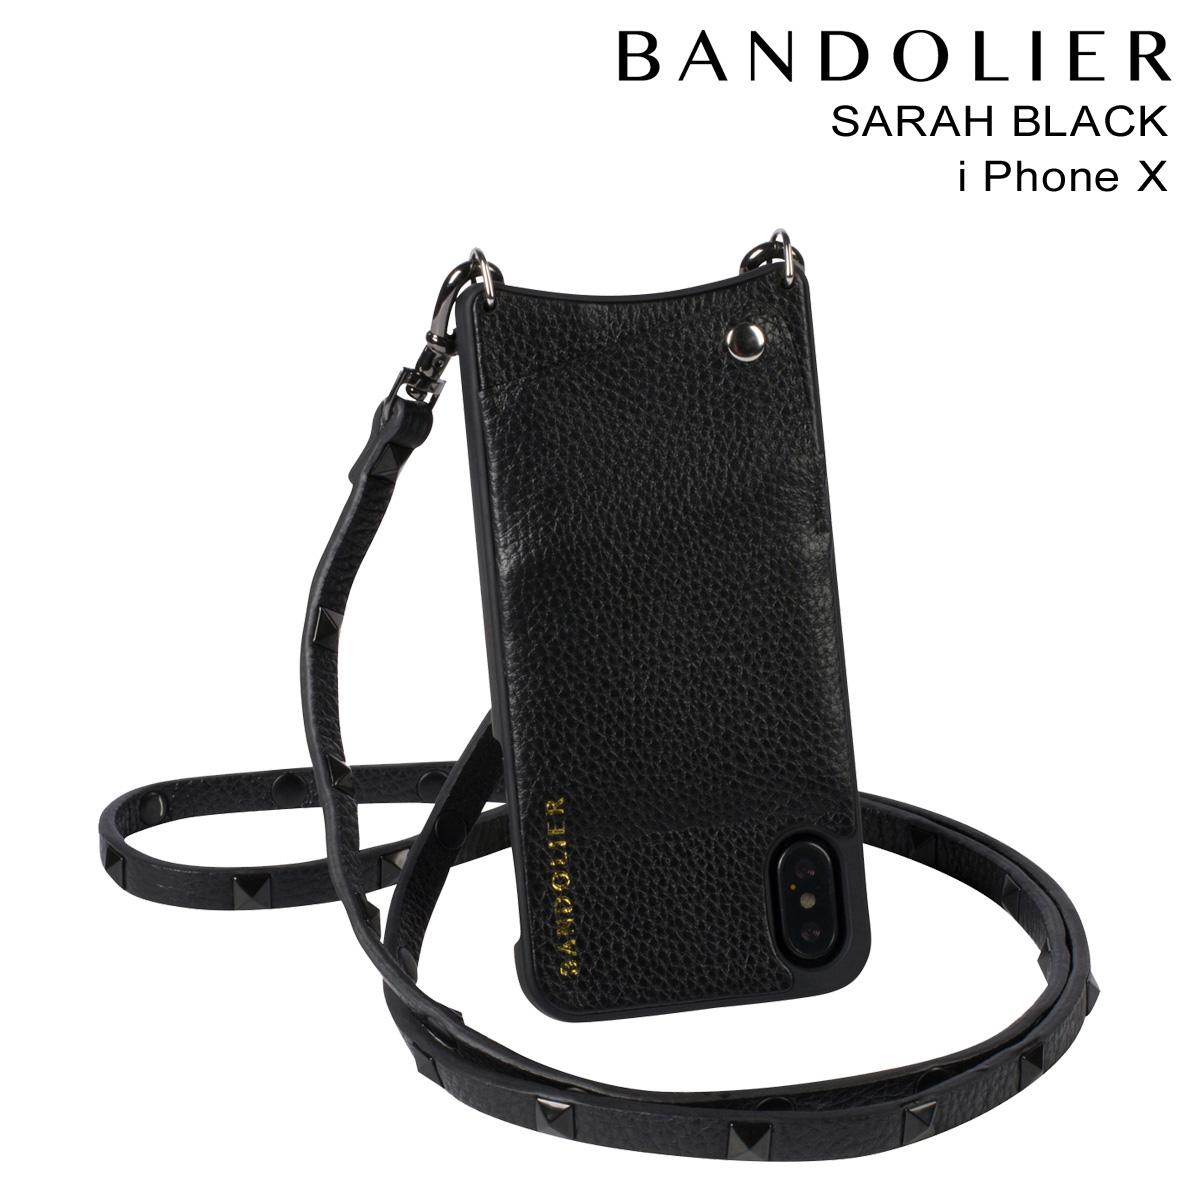 BANDOLIER バンドリヤー iPhoneX ケース スマホ アイフォン SARAH BLACK レザー メンズ レディース [9/14 追加入荷]